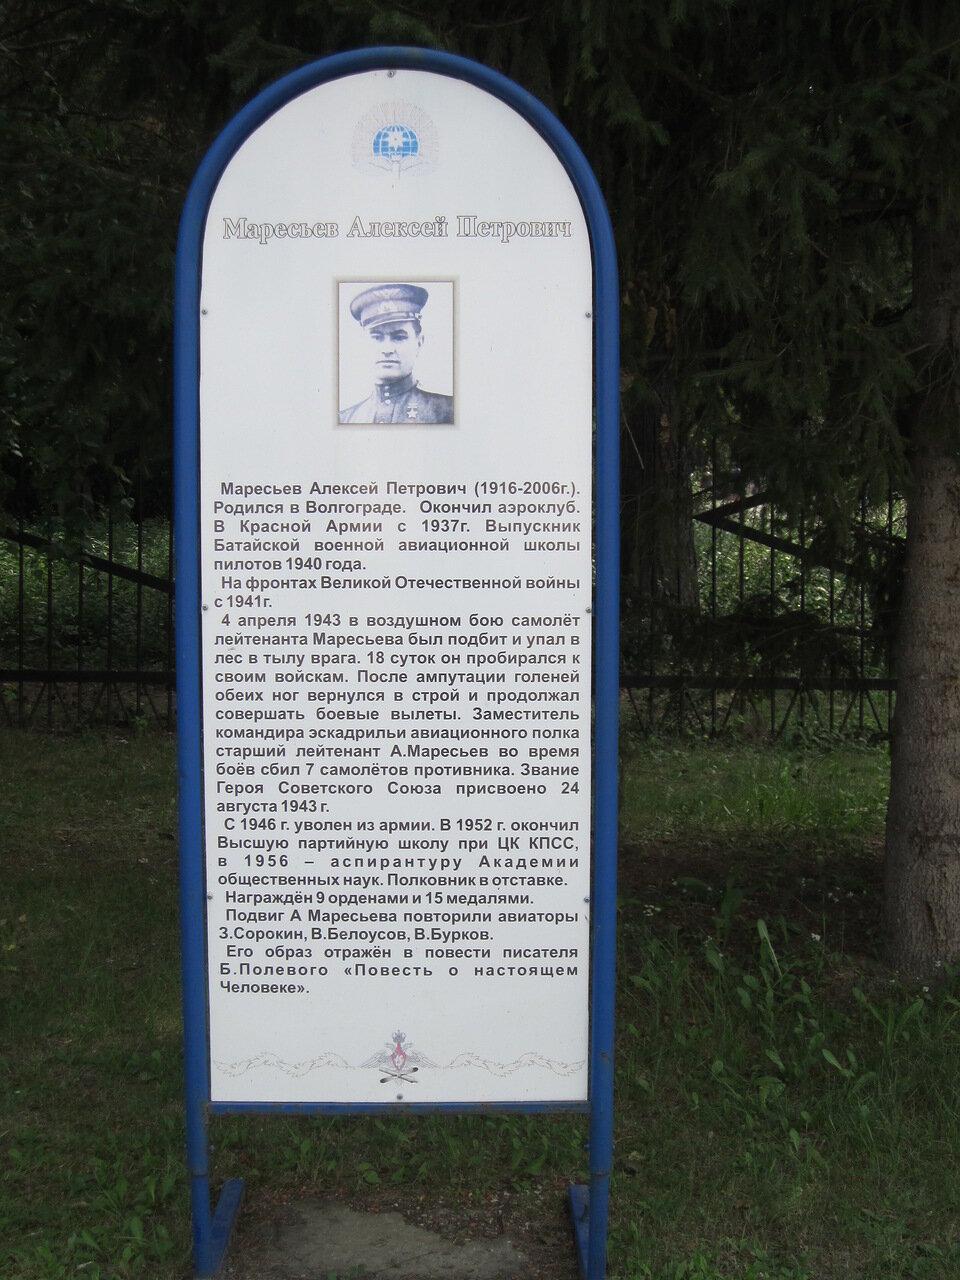 Наглядная агитация: биография Алексея Маресьева (15.08.2014)